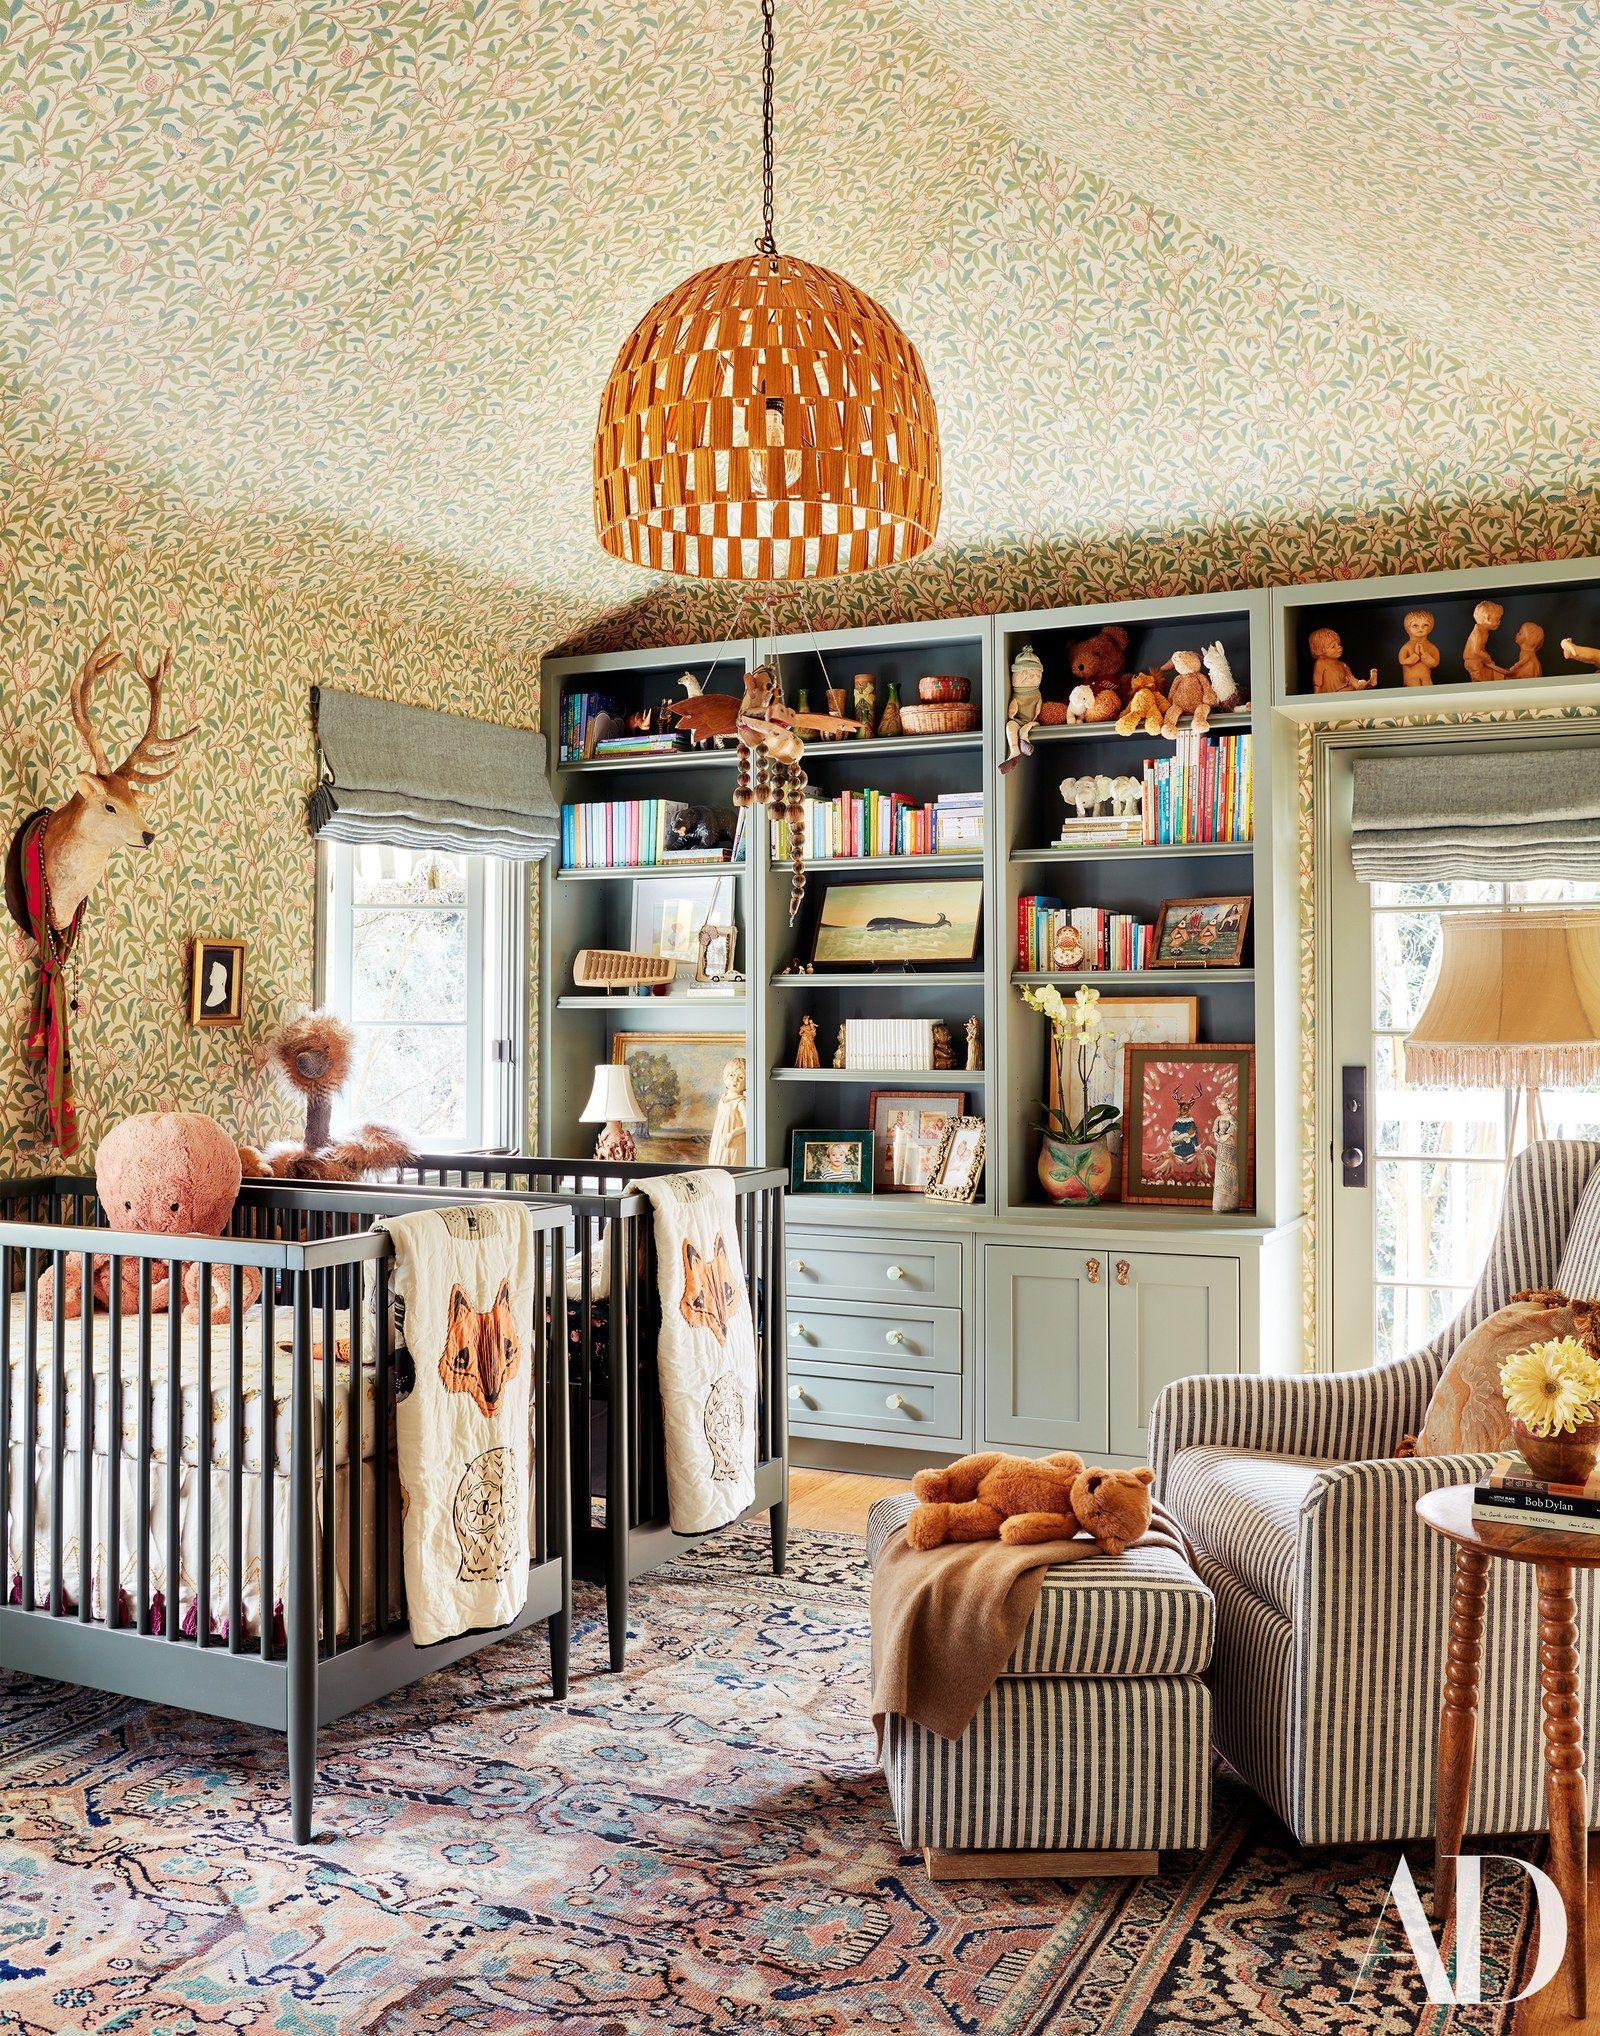 Image result for Family Treasure kids room